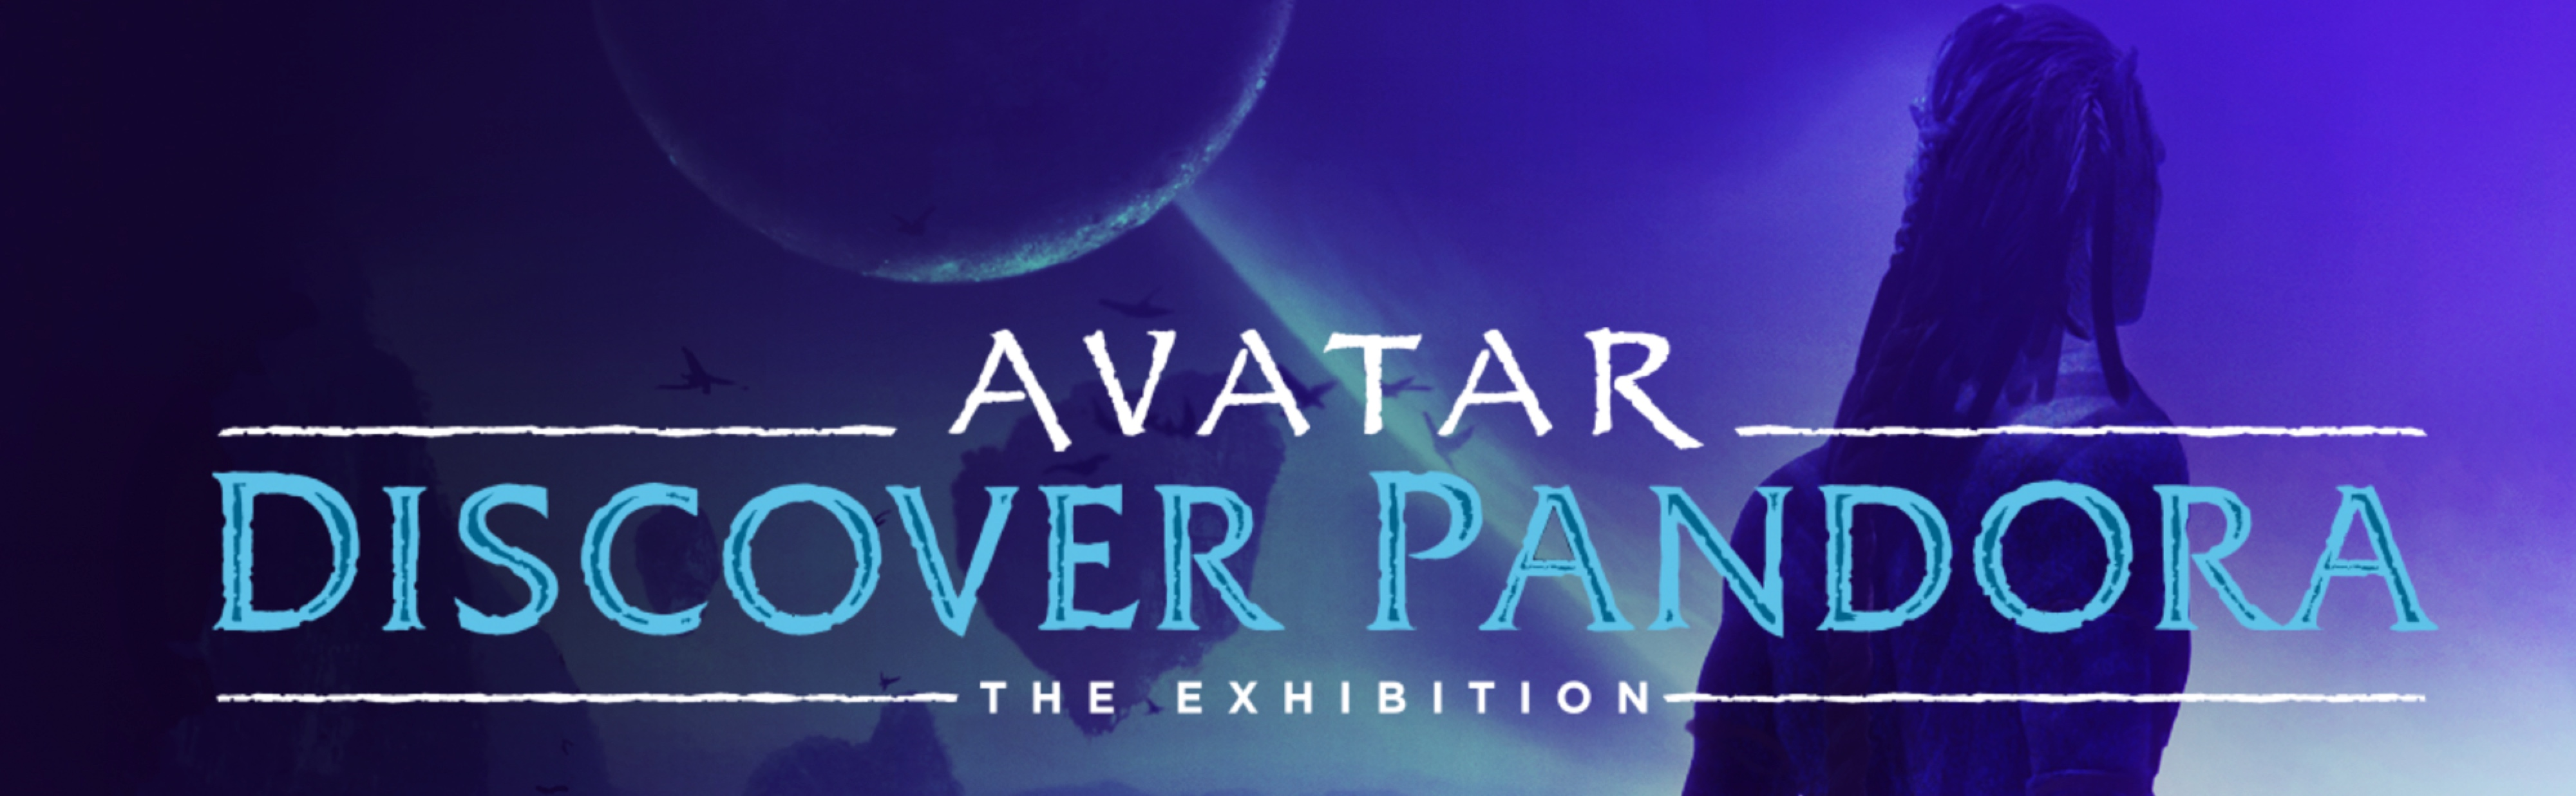 avatar discover pandora concept art exhibition opening december 2016